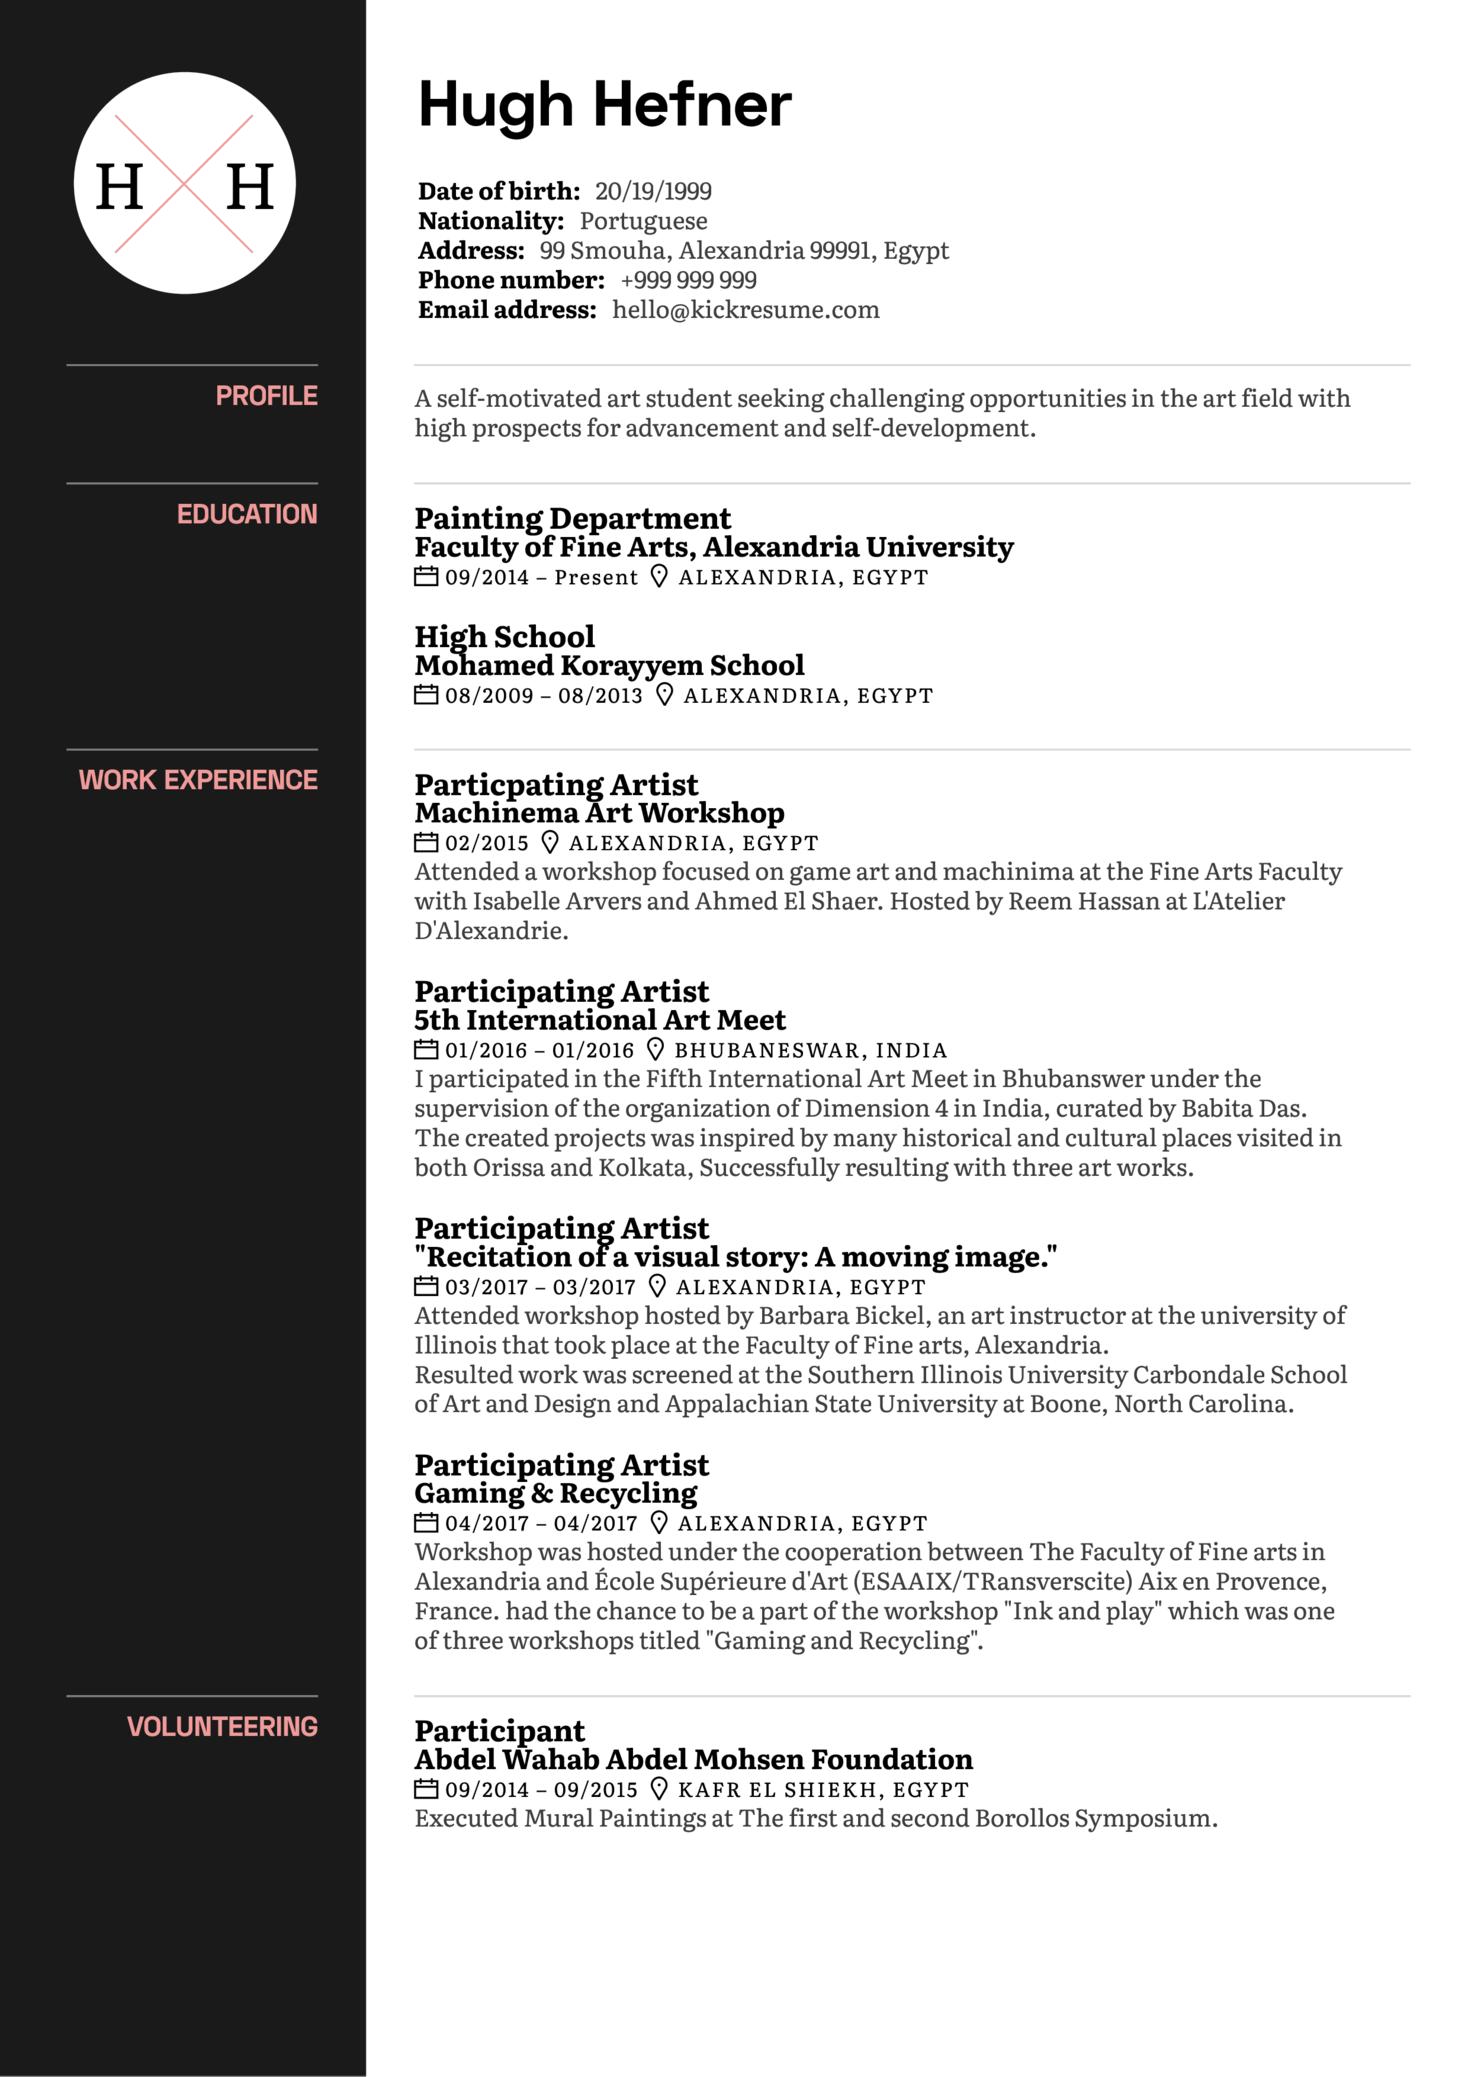 Art Curator CV Sample (Part 1)